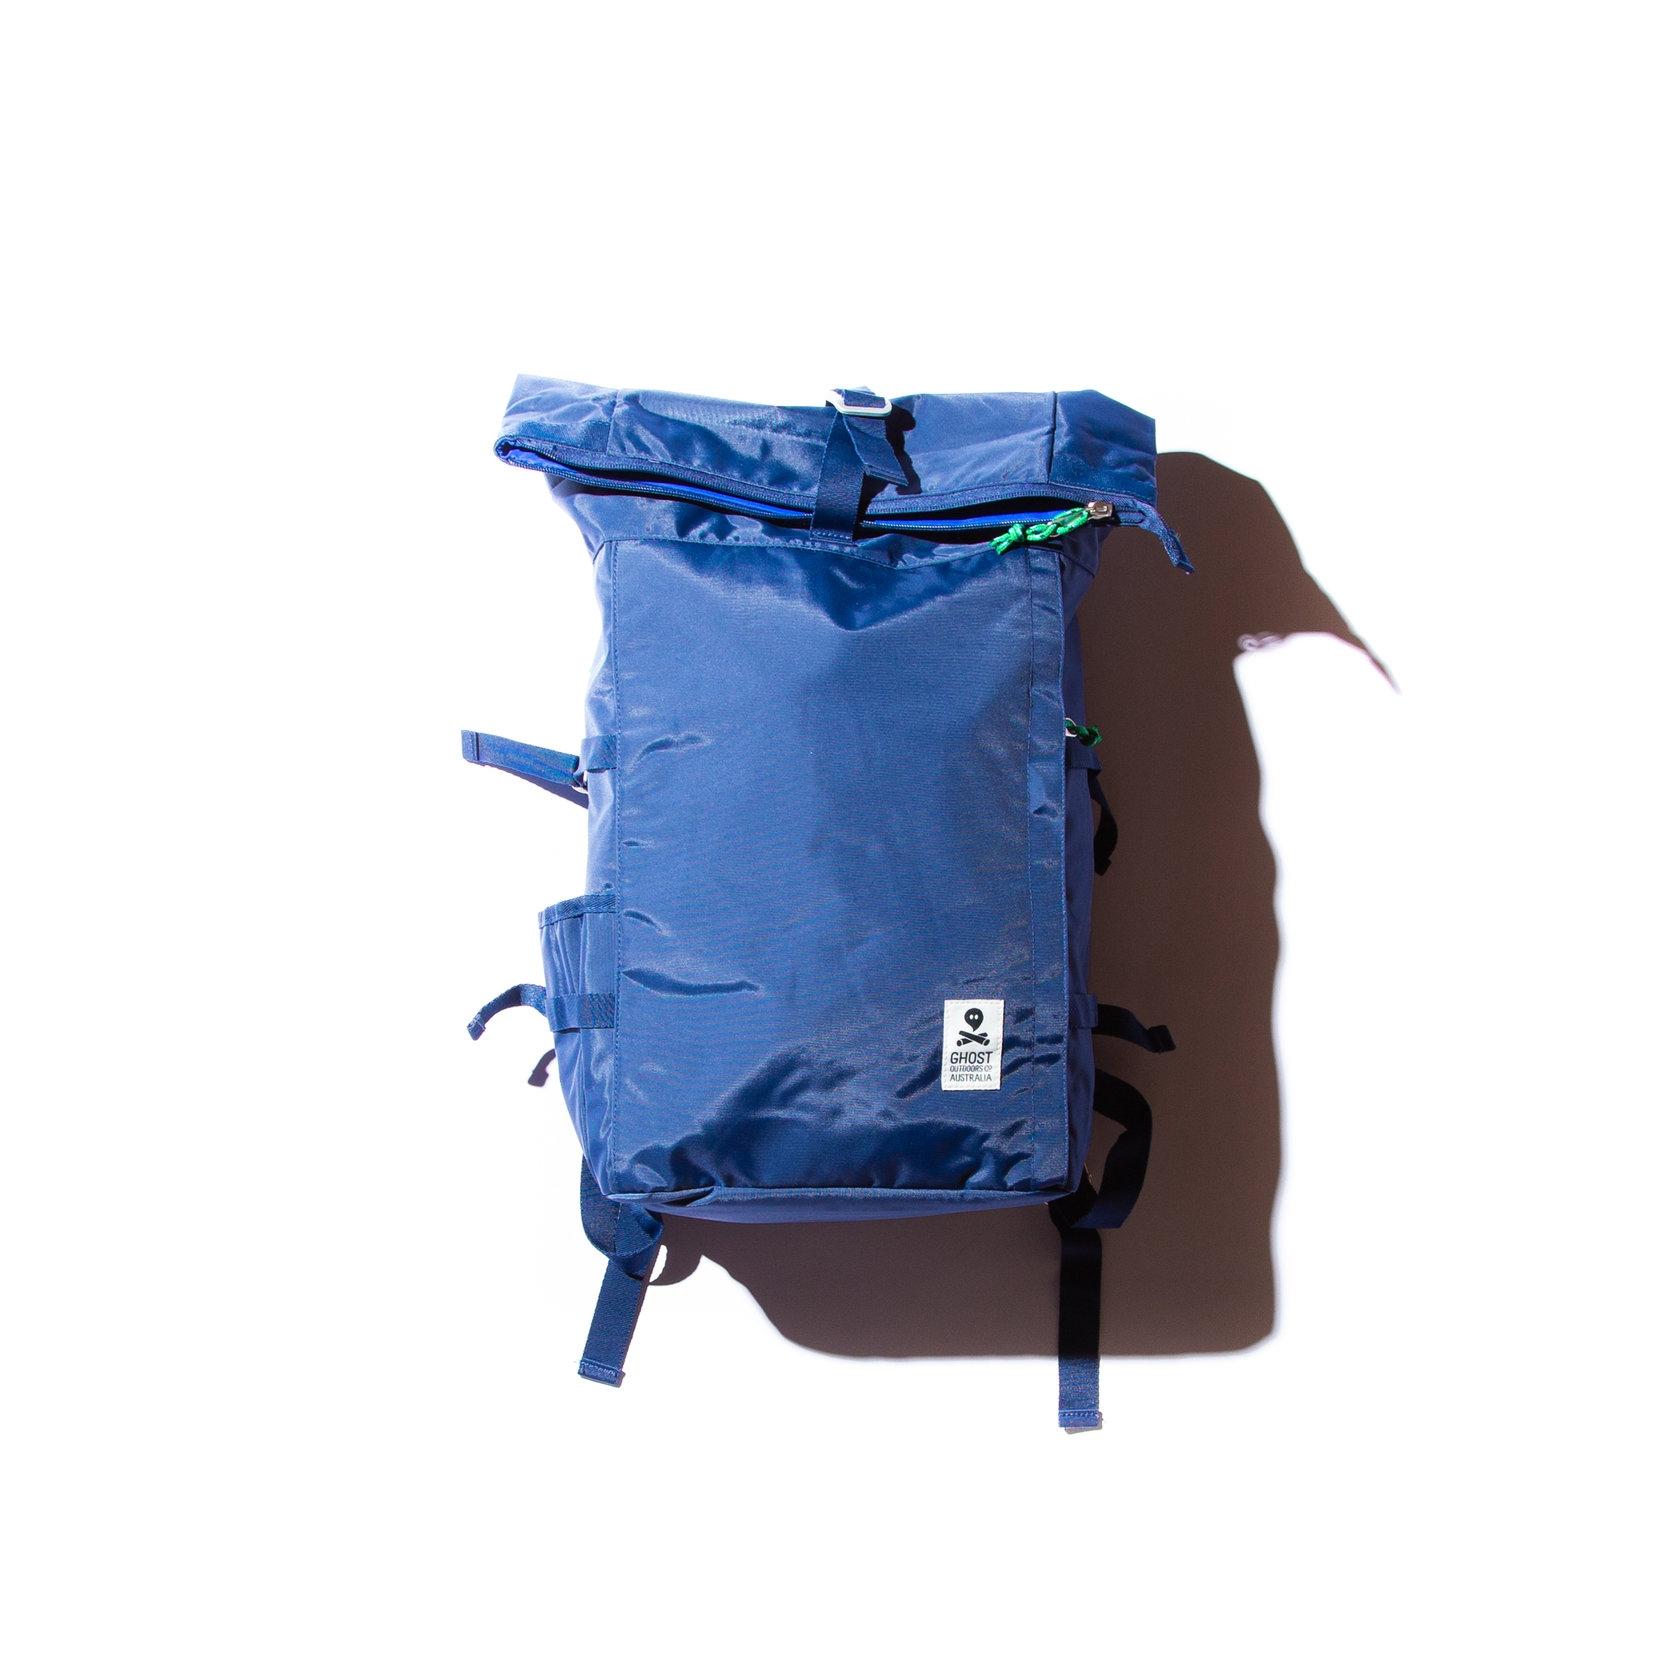 $149 - Ultimate Navy Rucksack